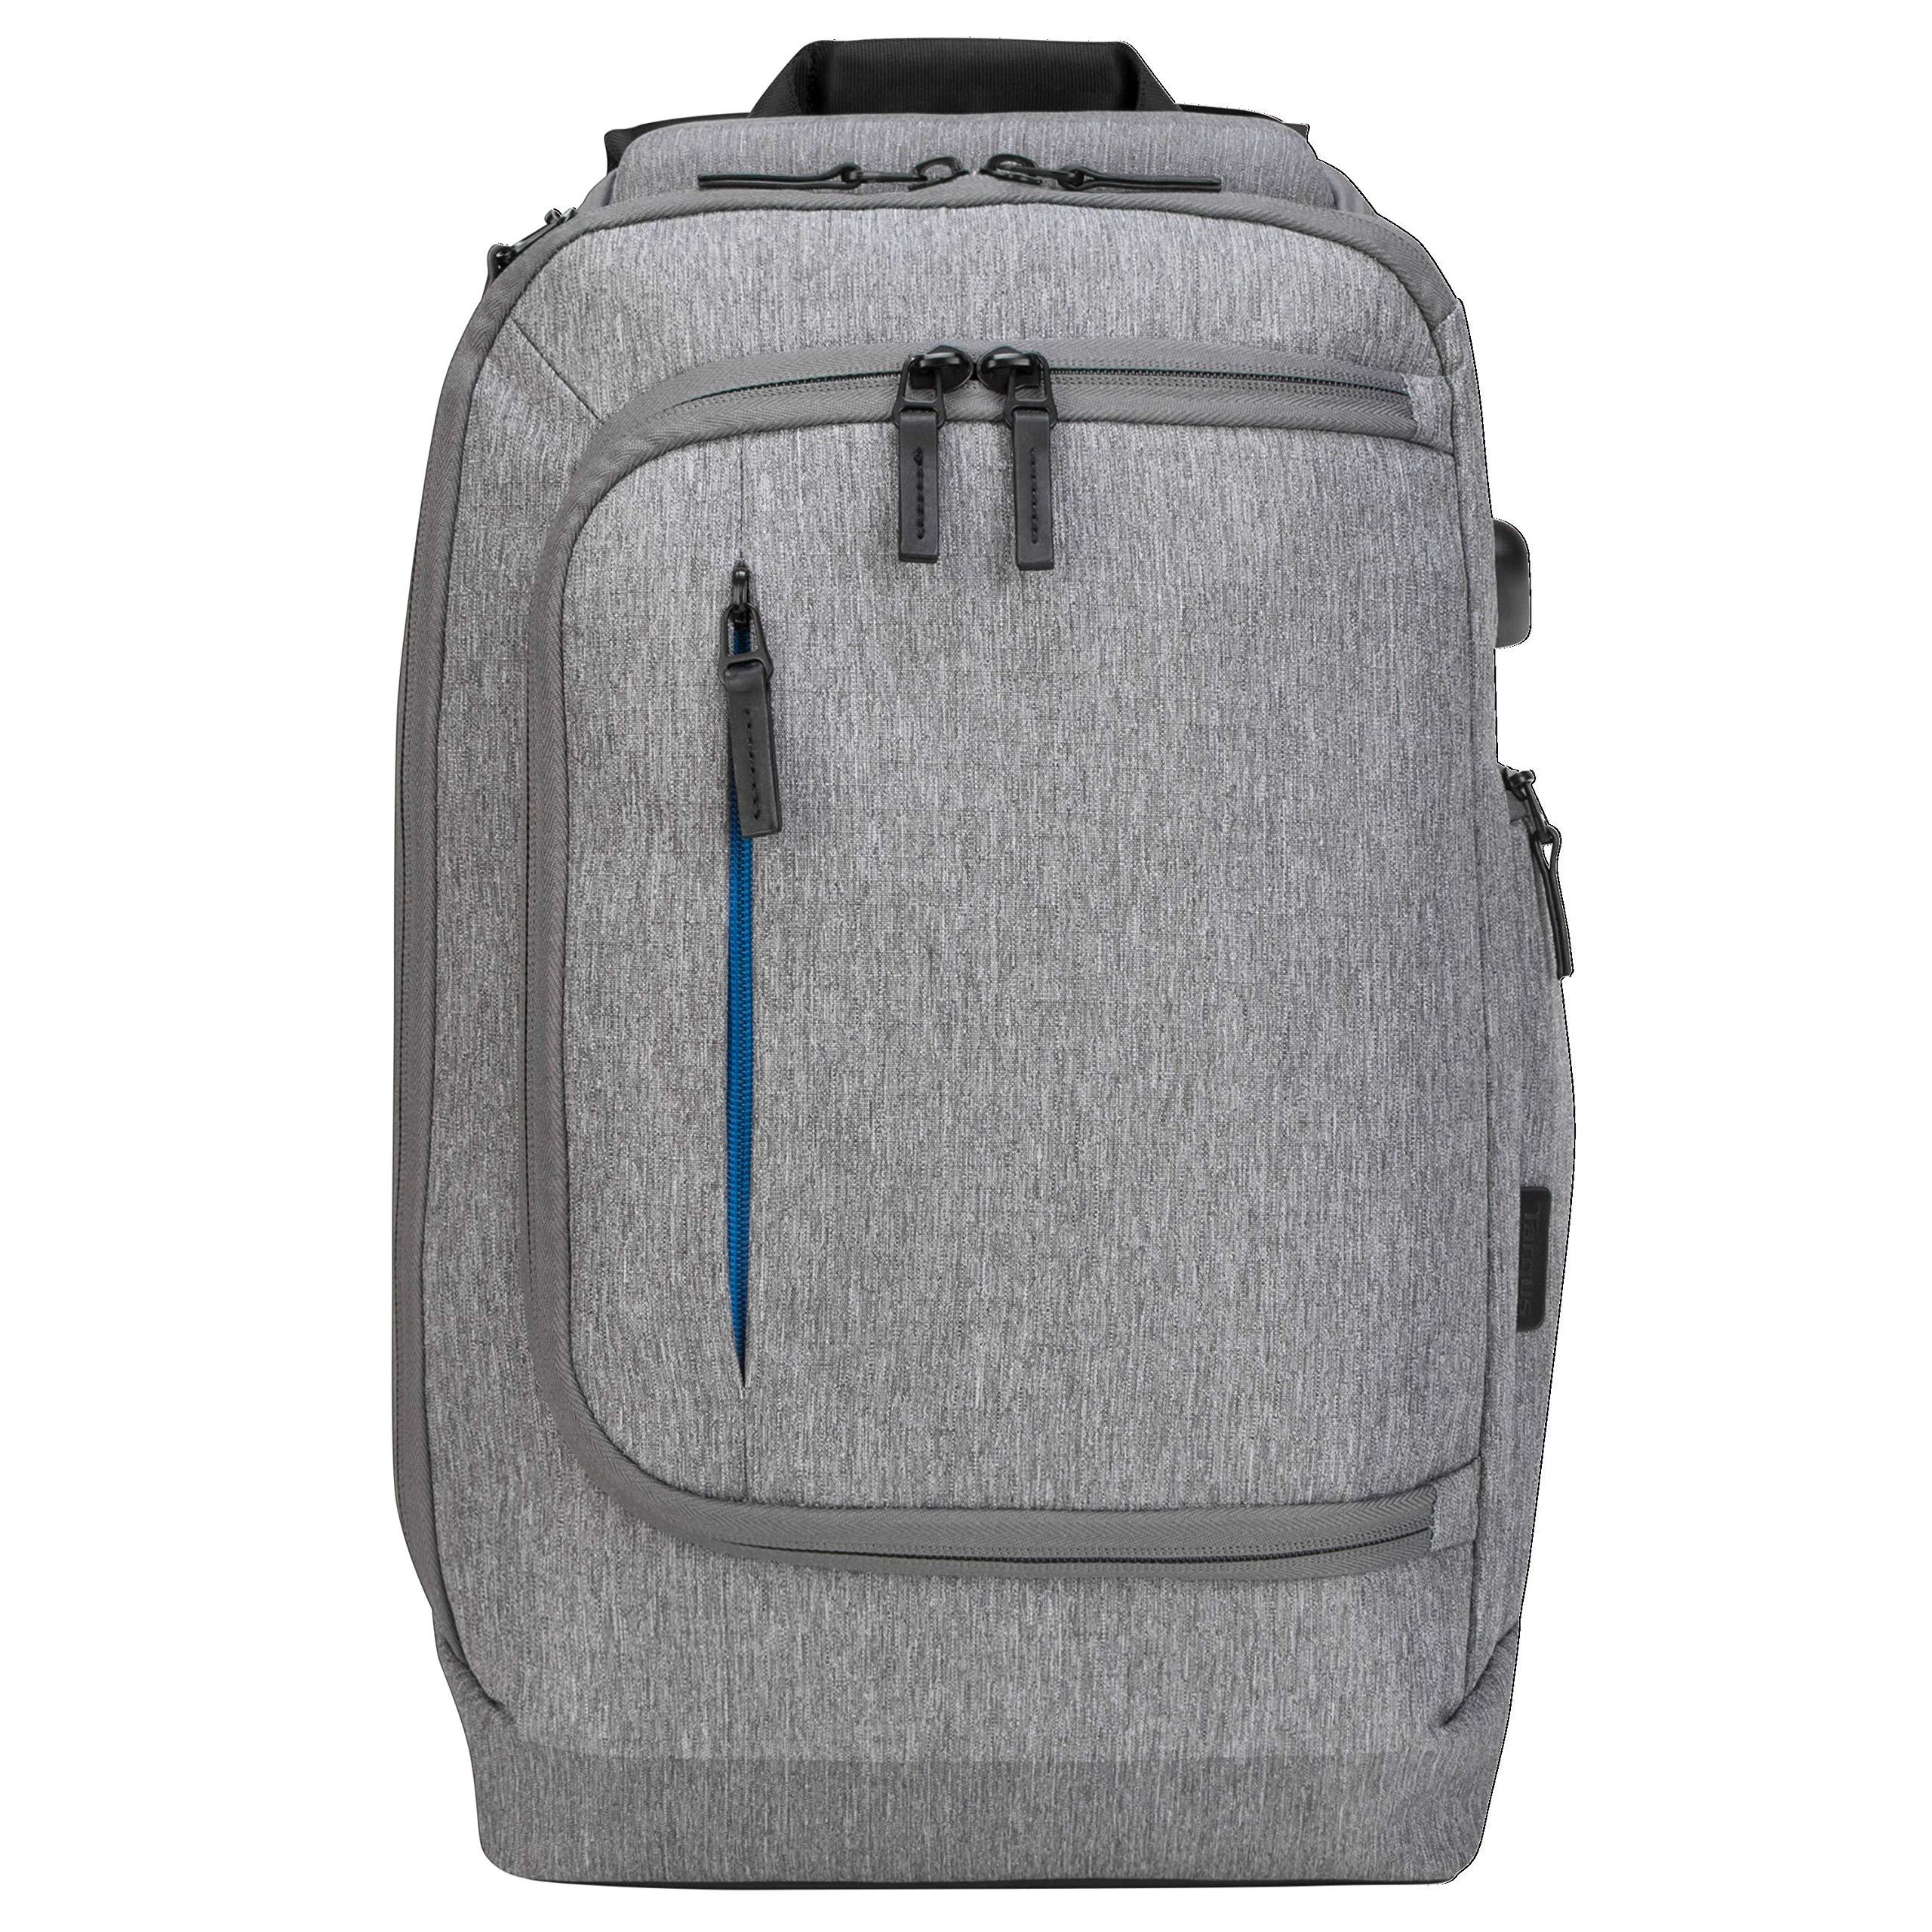 Targus CityLite Pro Premium Convertible Backpack for 15.6-Inch Laptop, Grey (TSB939GL)